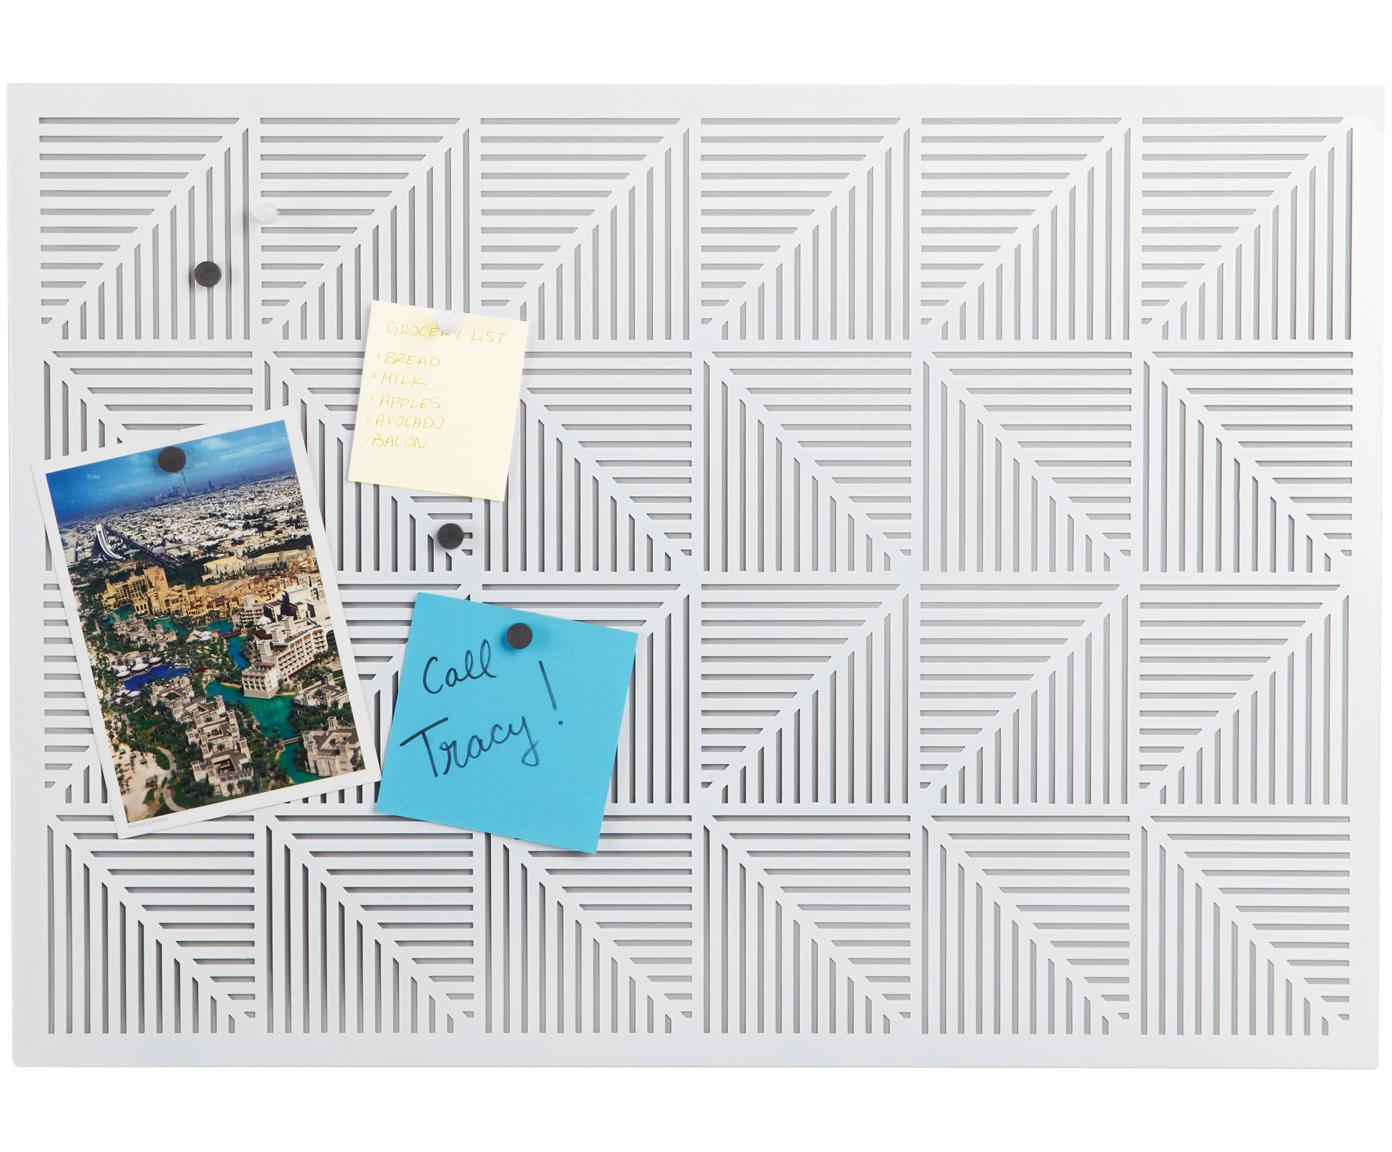 Bacheca da parete Trigon, Metallo, gommapiuma, Bianco, L 53 x A 38 cm